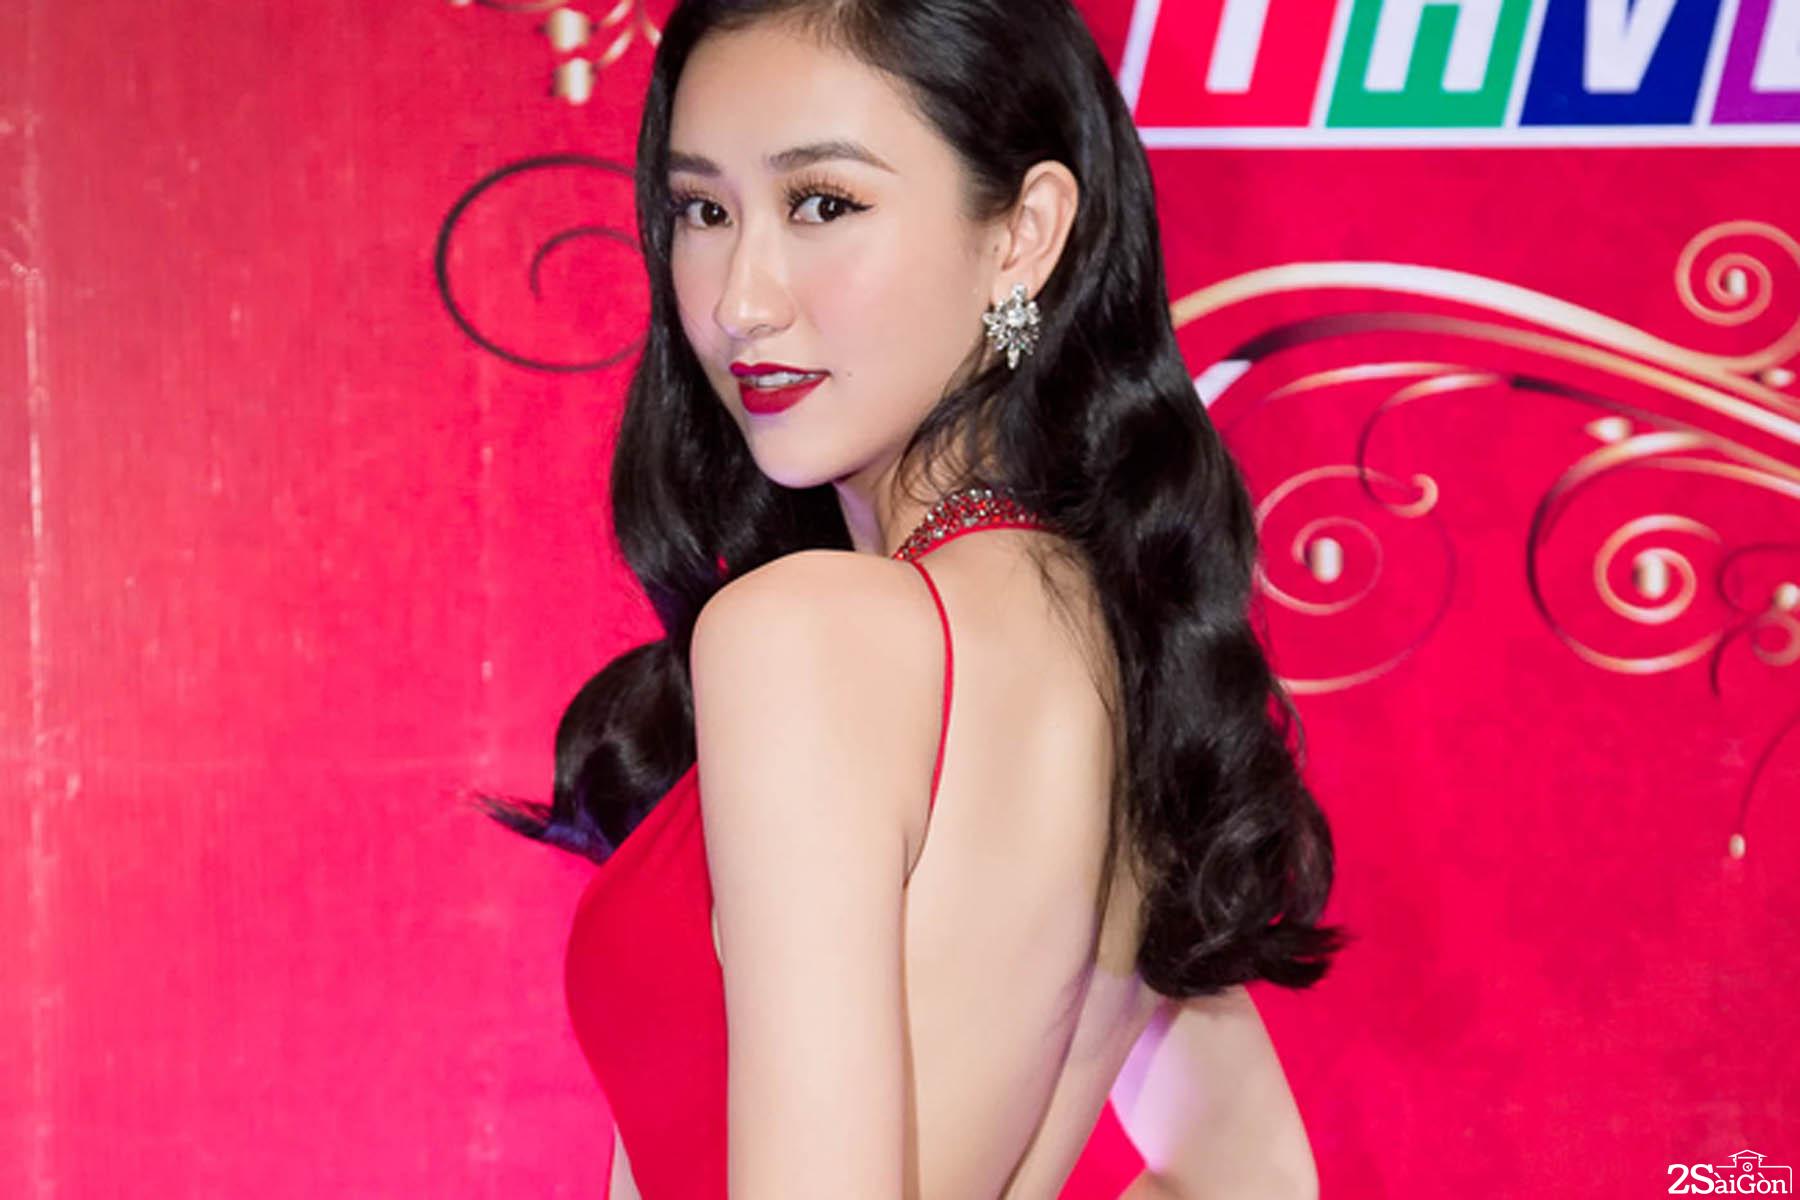 A hau Ha Thu - Photo Th_nh Nh_n (11hh)